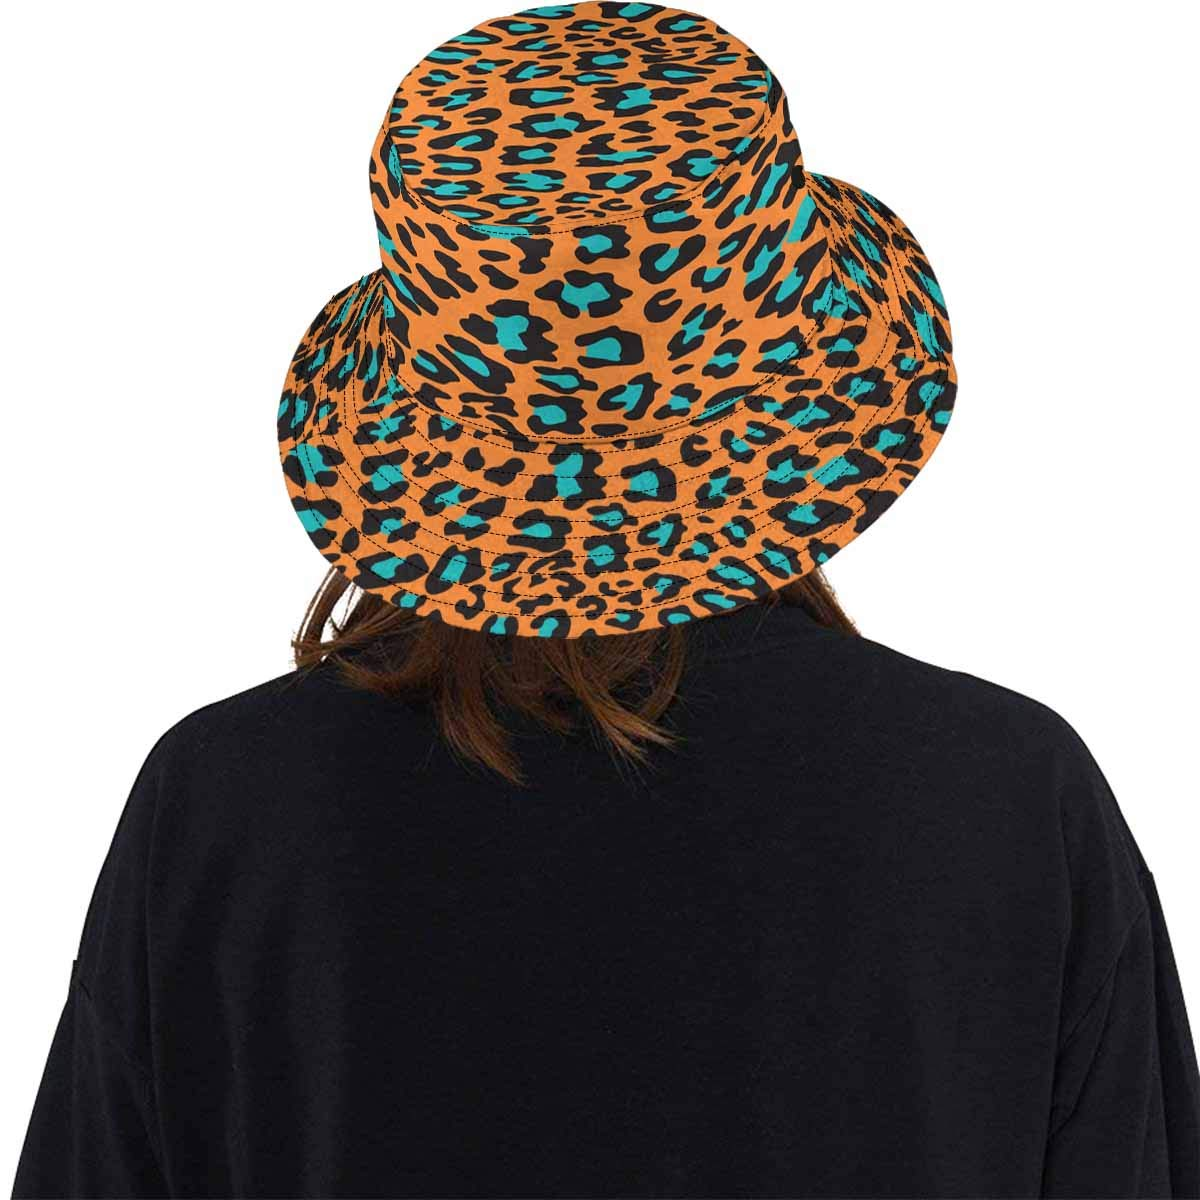 INTERESTPRINT Animal Leopard Prints Bucket Hat Boonie Sun Hats